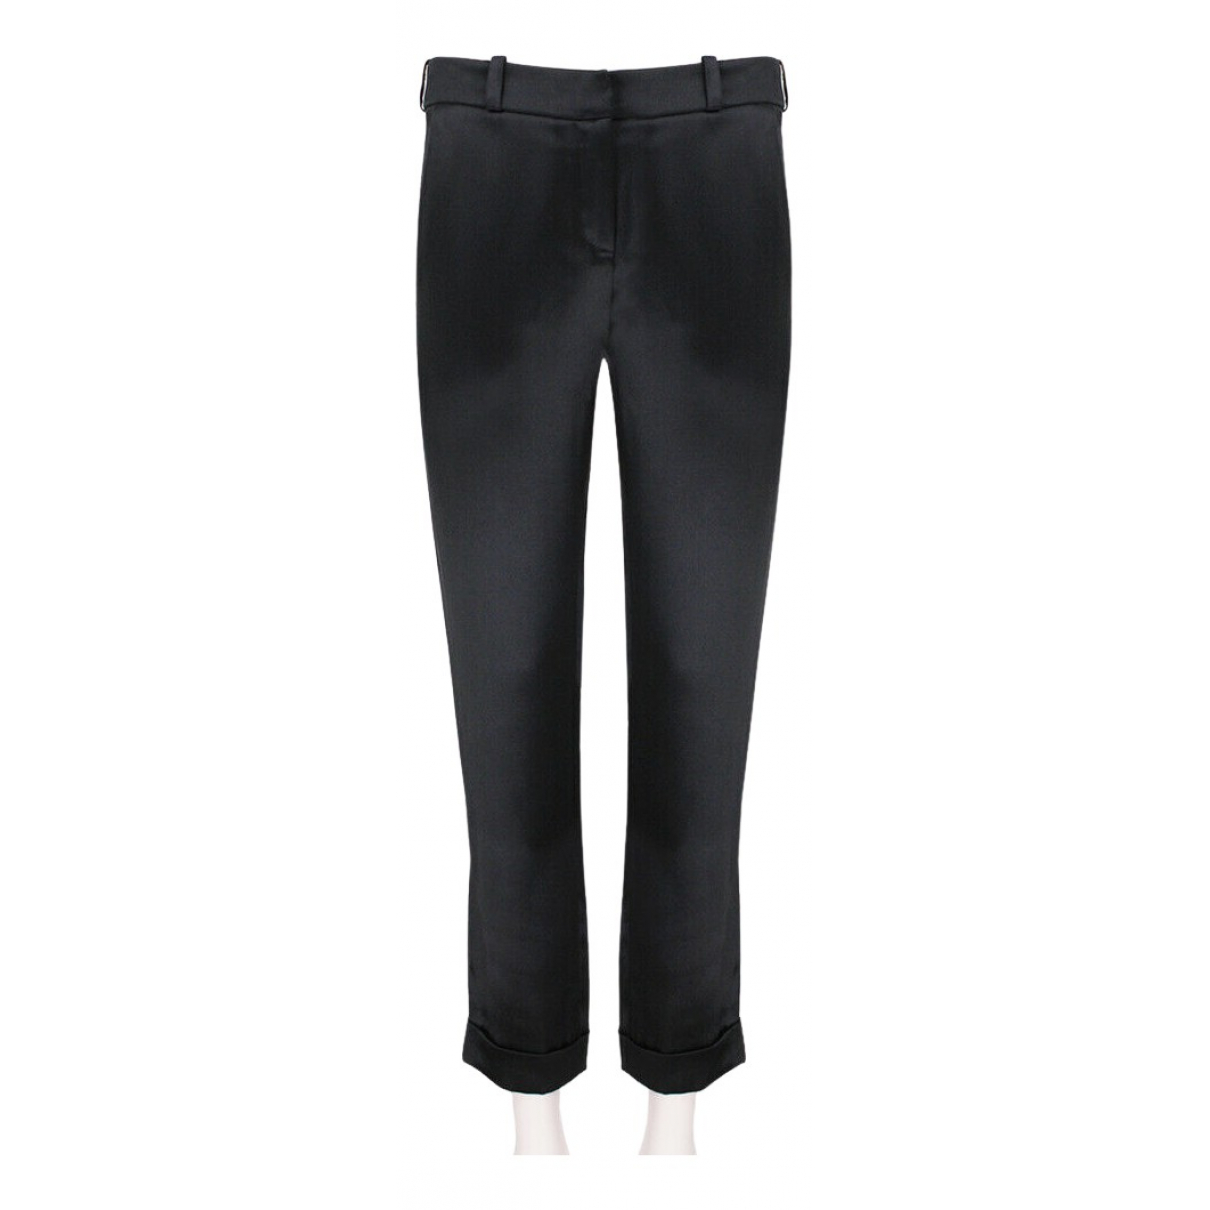 Balmain N Black Trousers for Women 38 FR